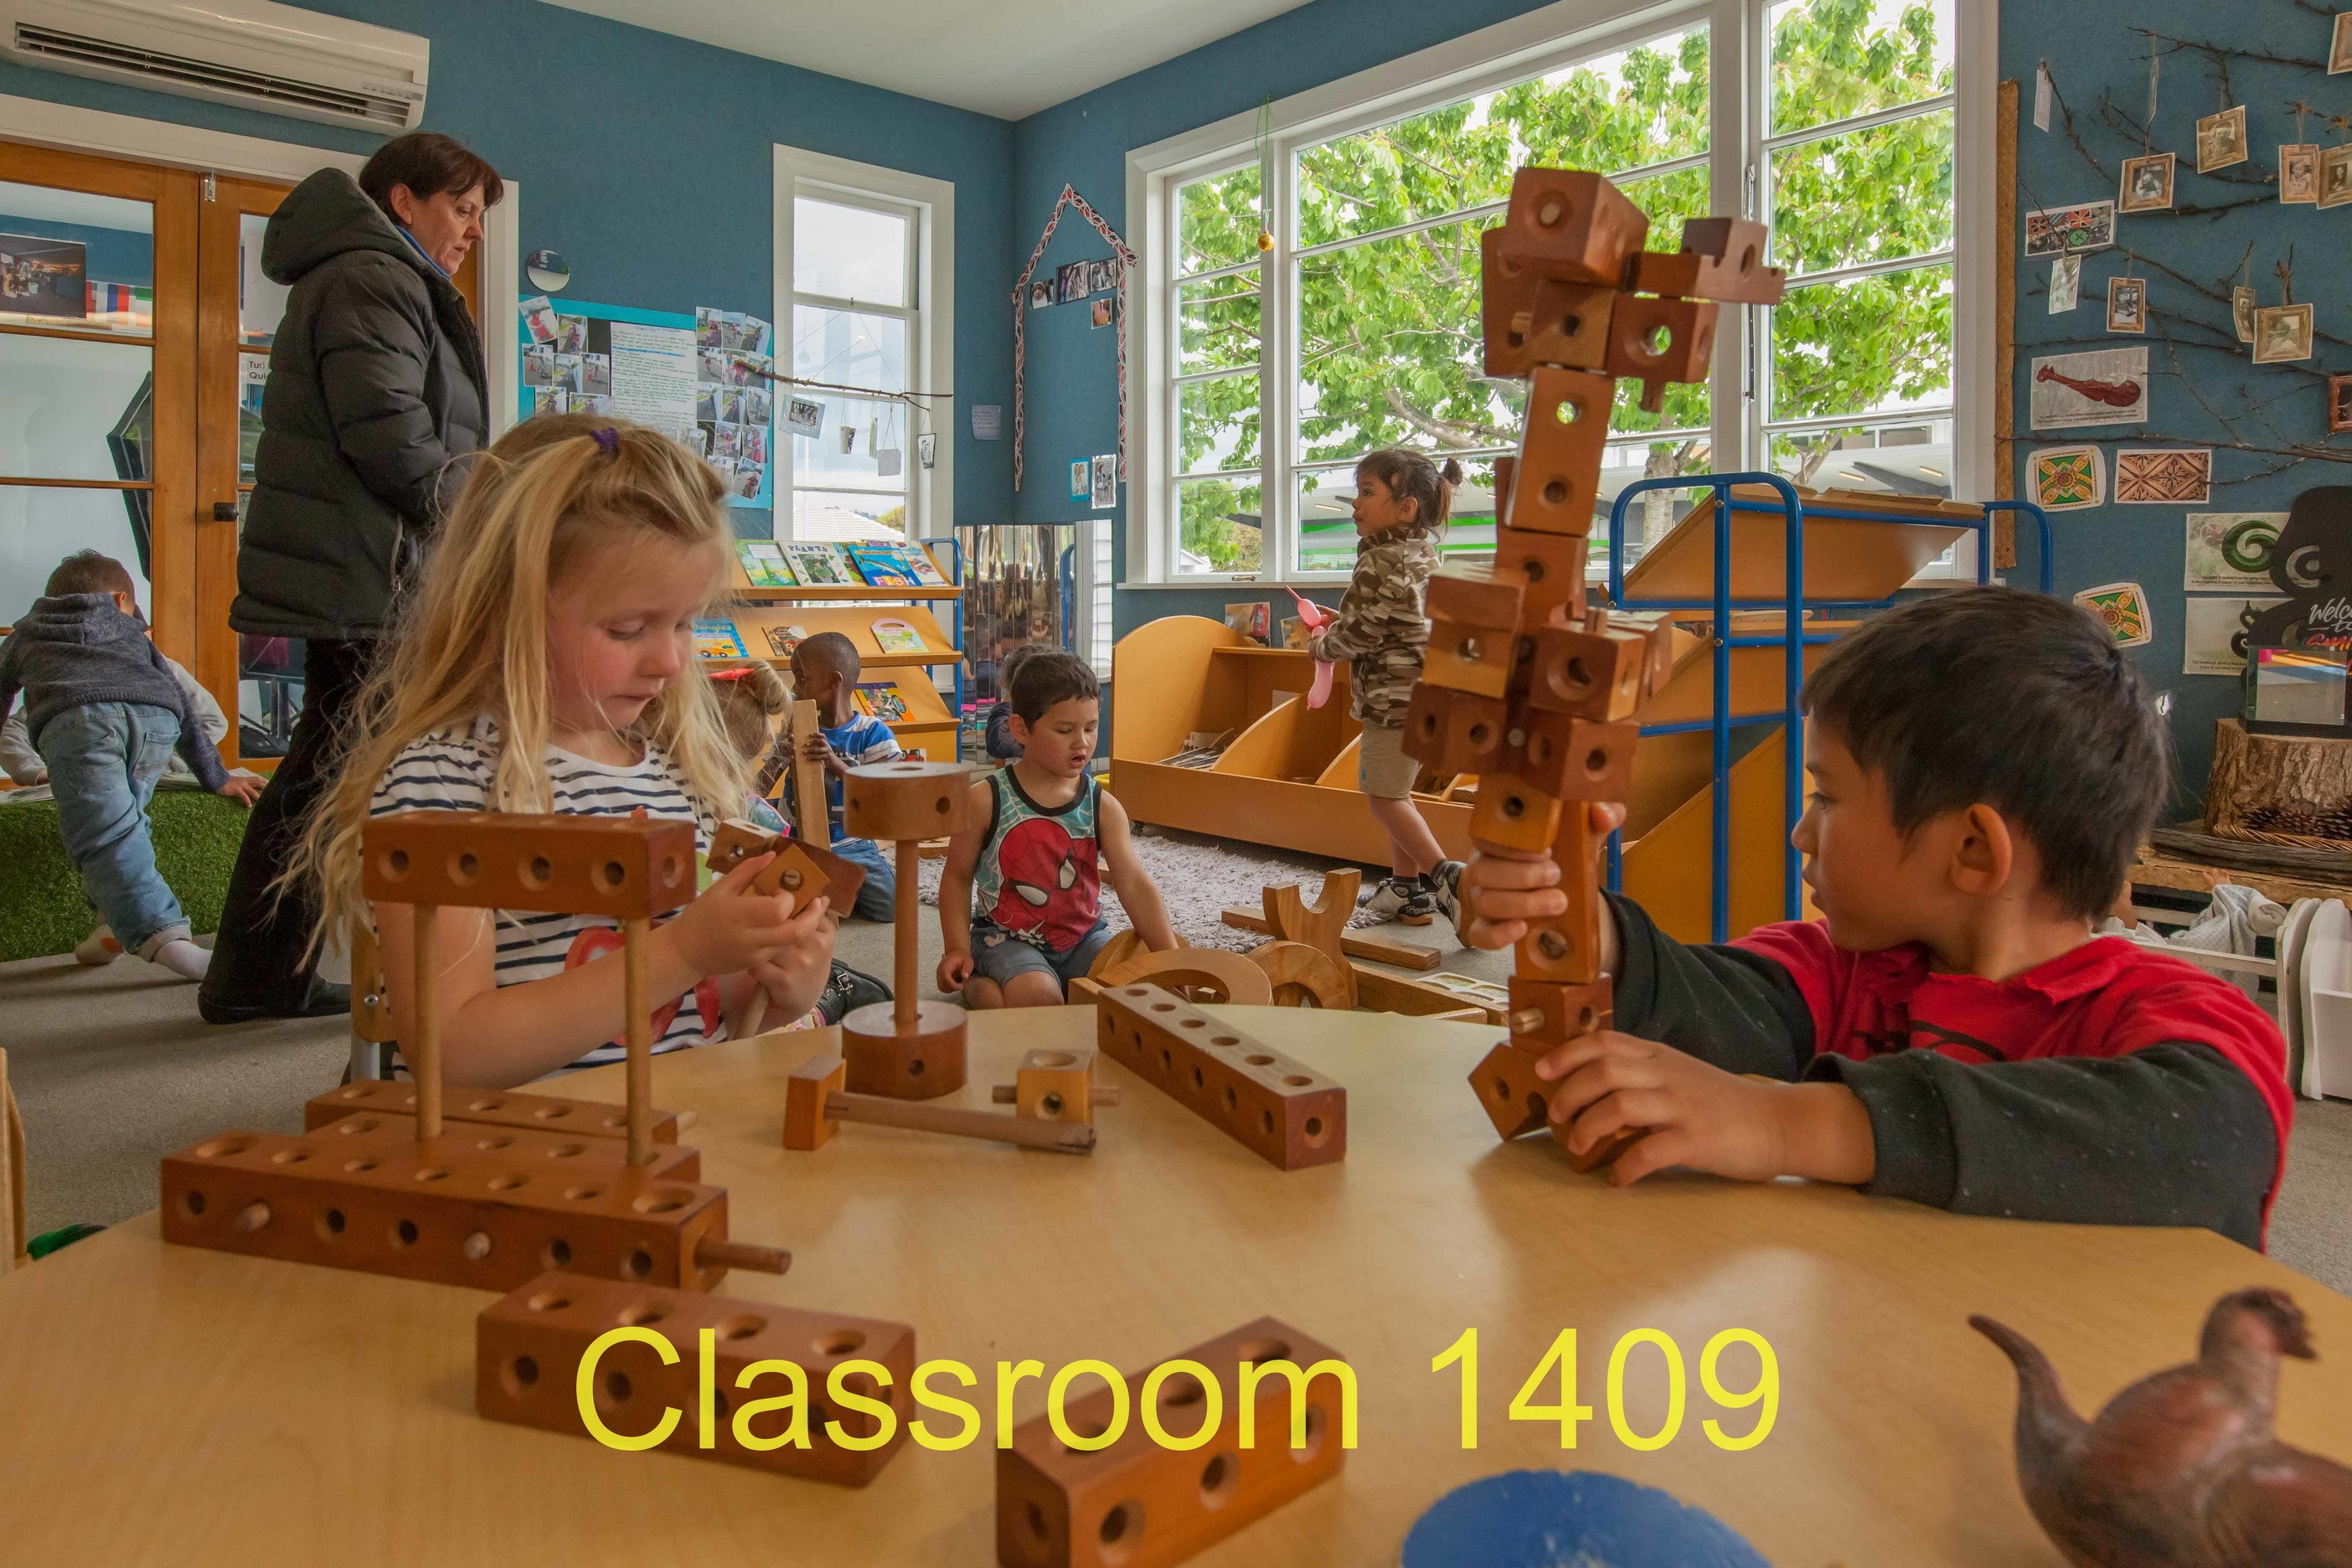 Classroom 1409